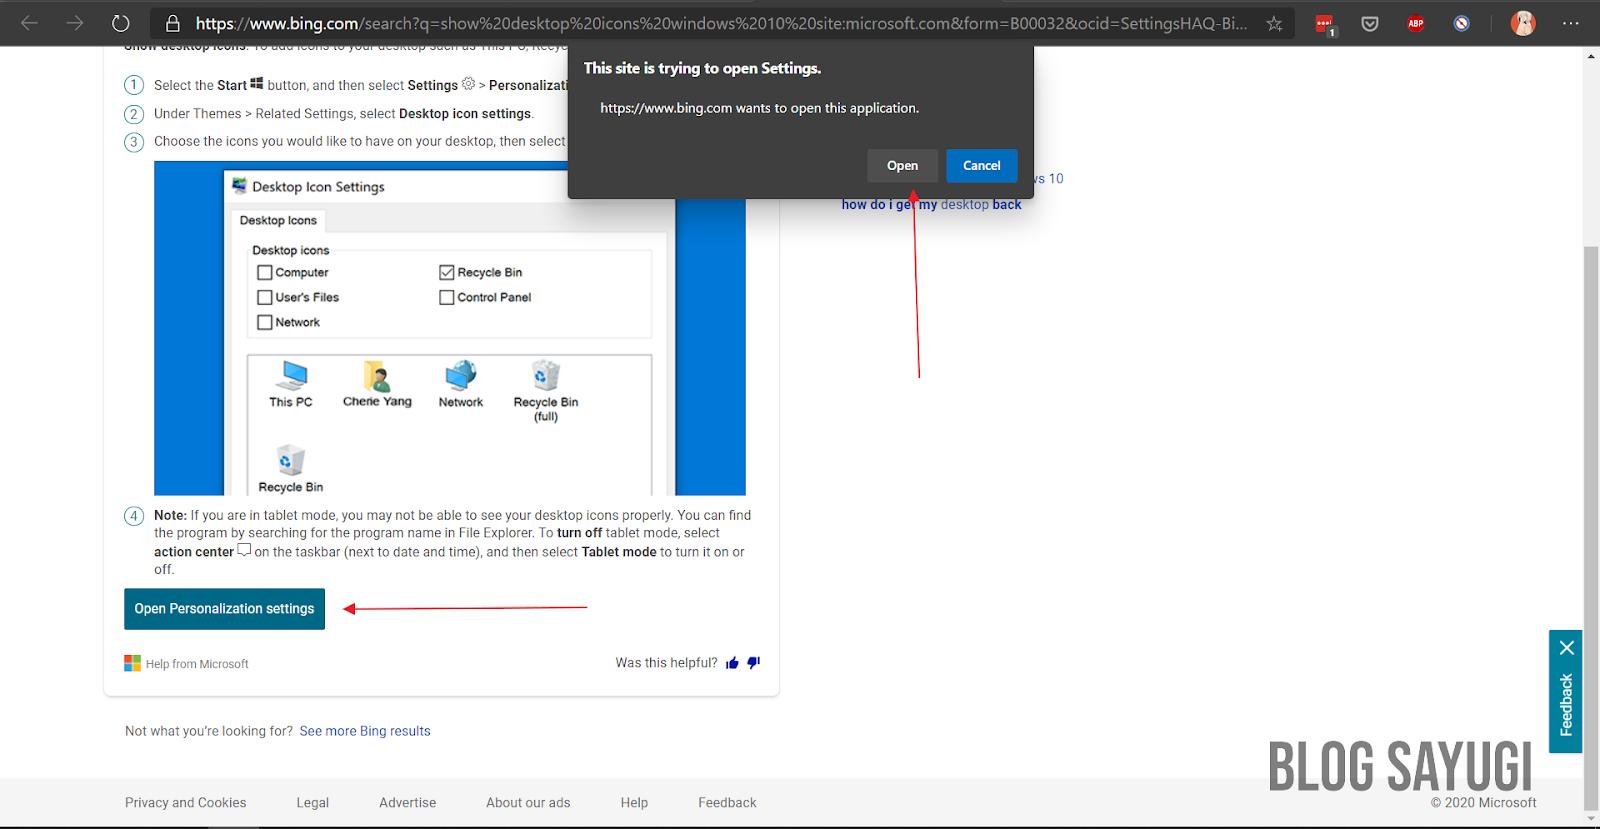 Cara Menghilangkan Recycle Bin Di Windows 10 - BLOG SAYUGI